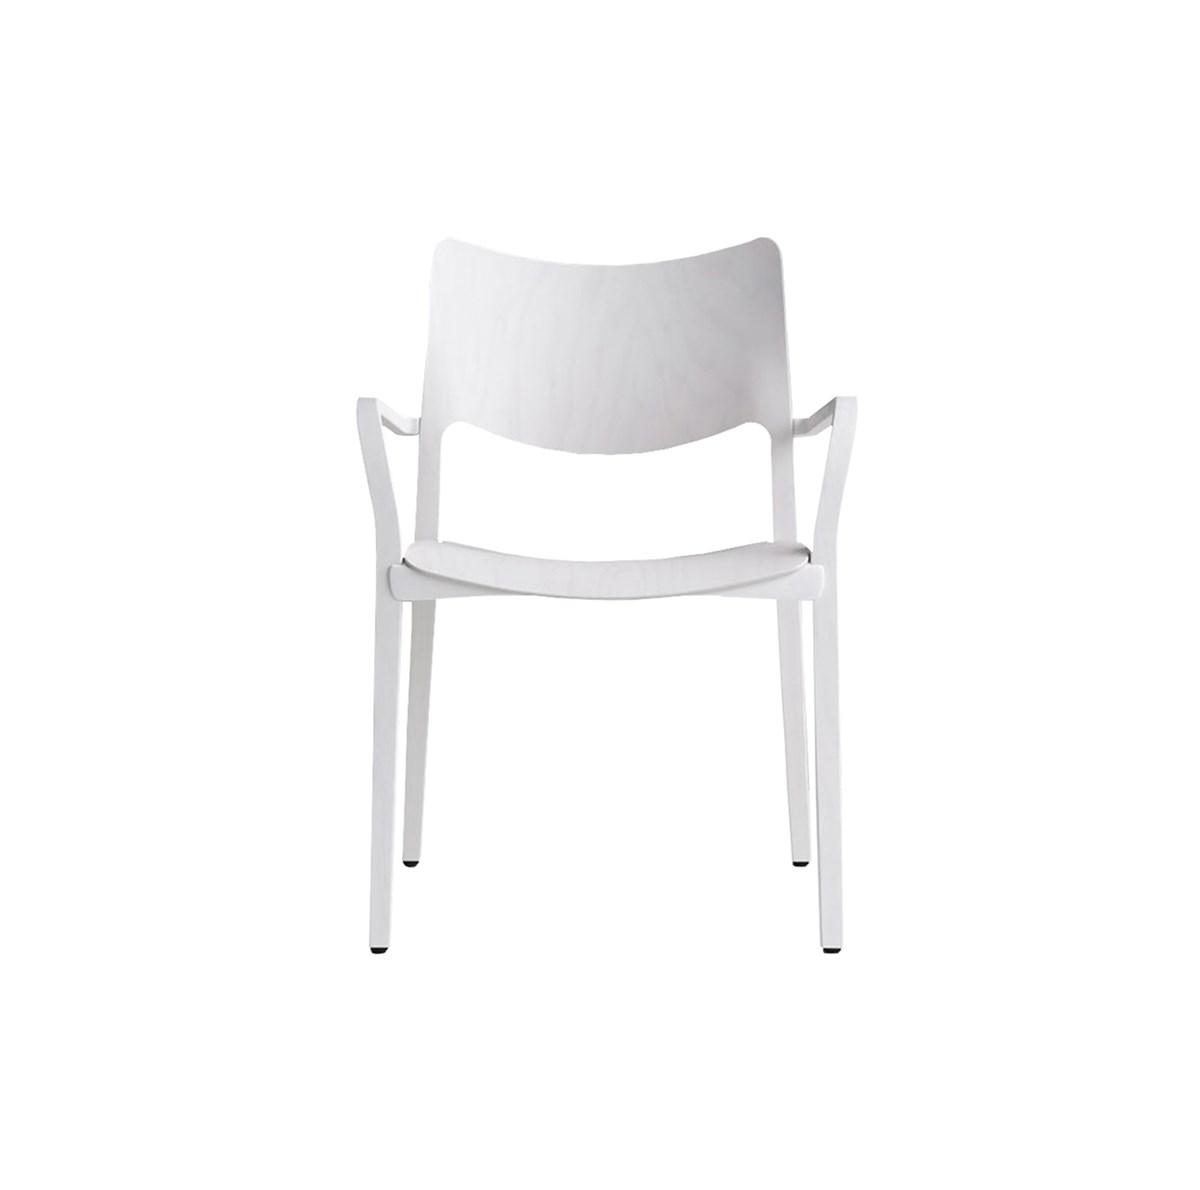 Stua-Jesus-Gasca-Laclasica-Armchair-Matisse-1